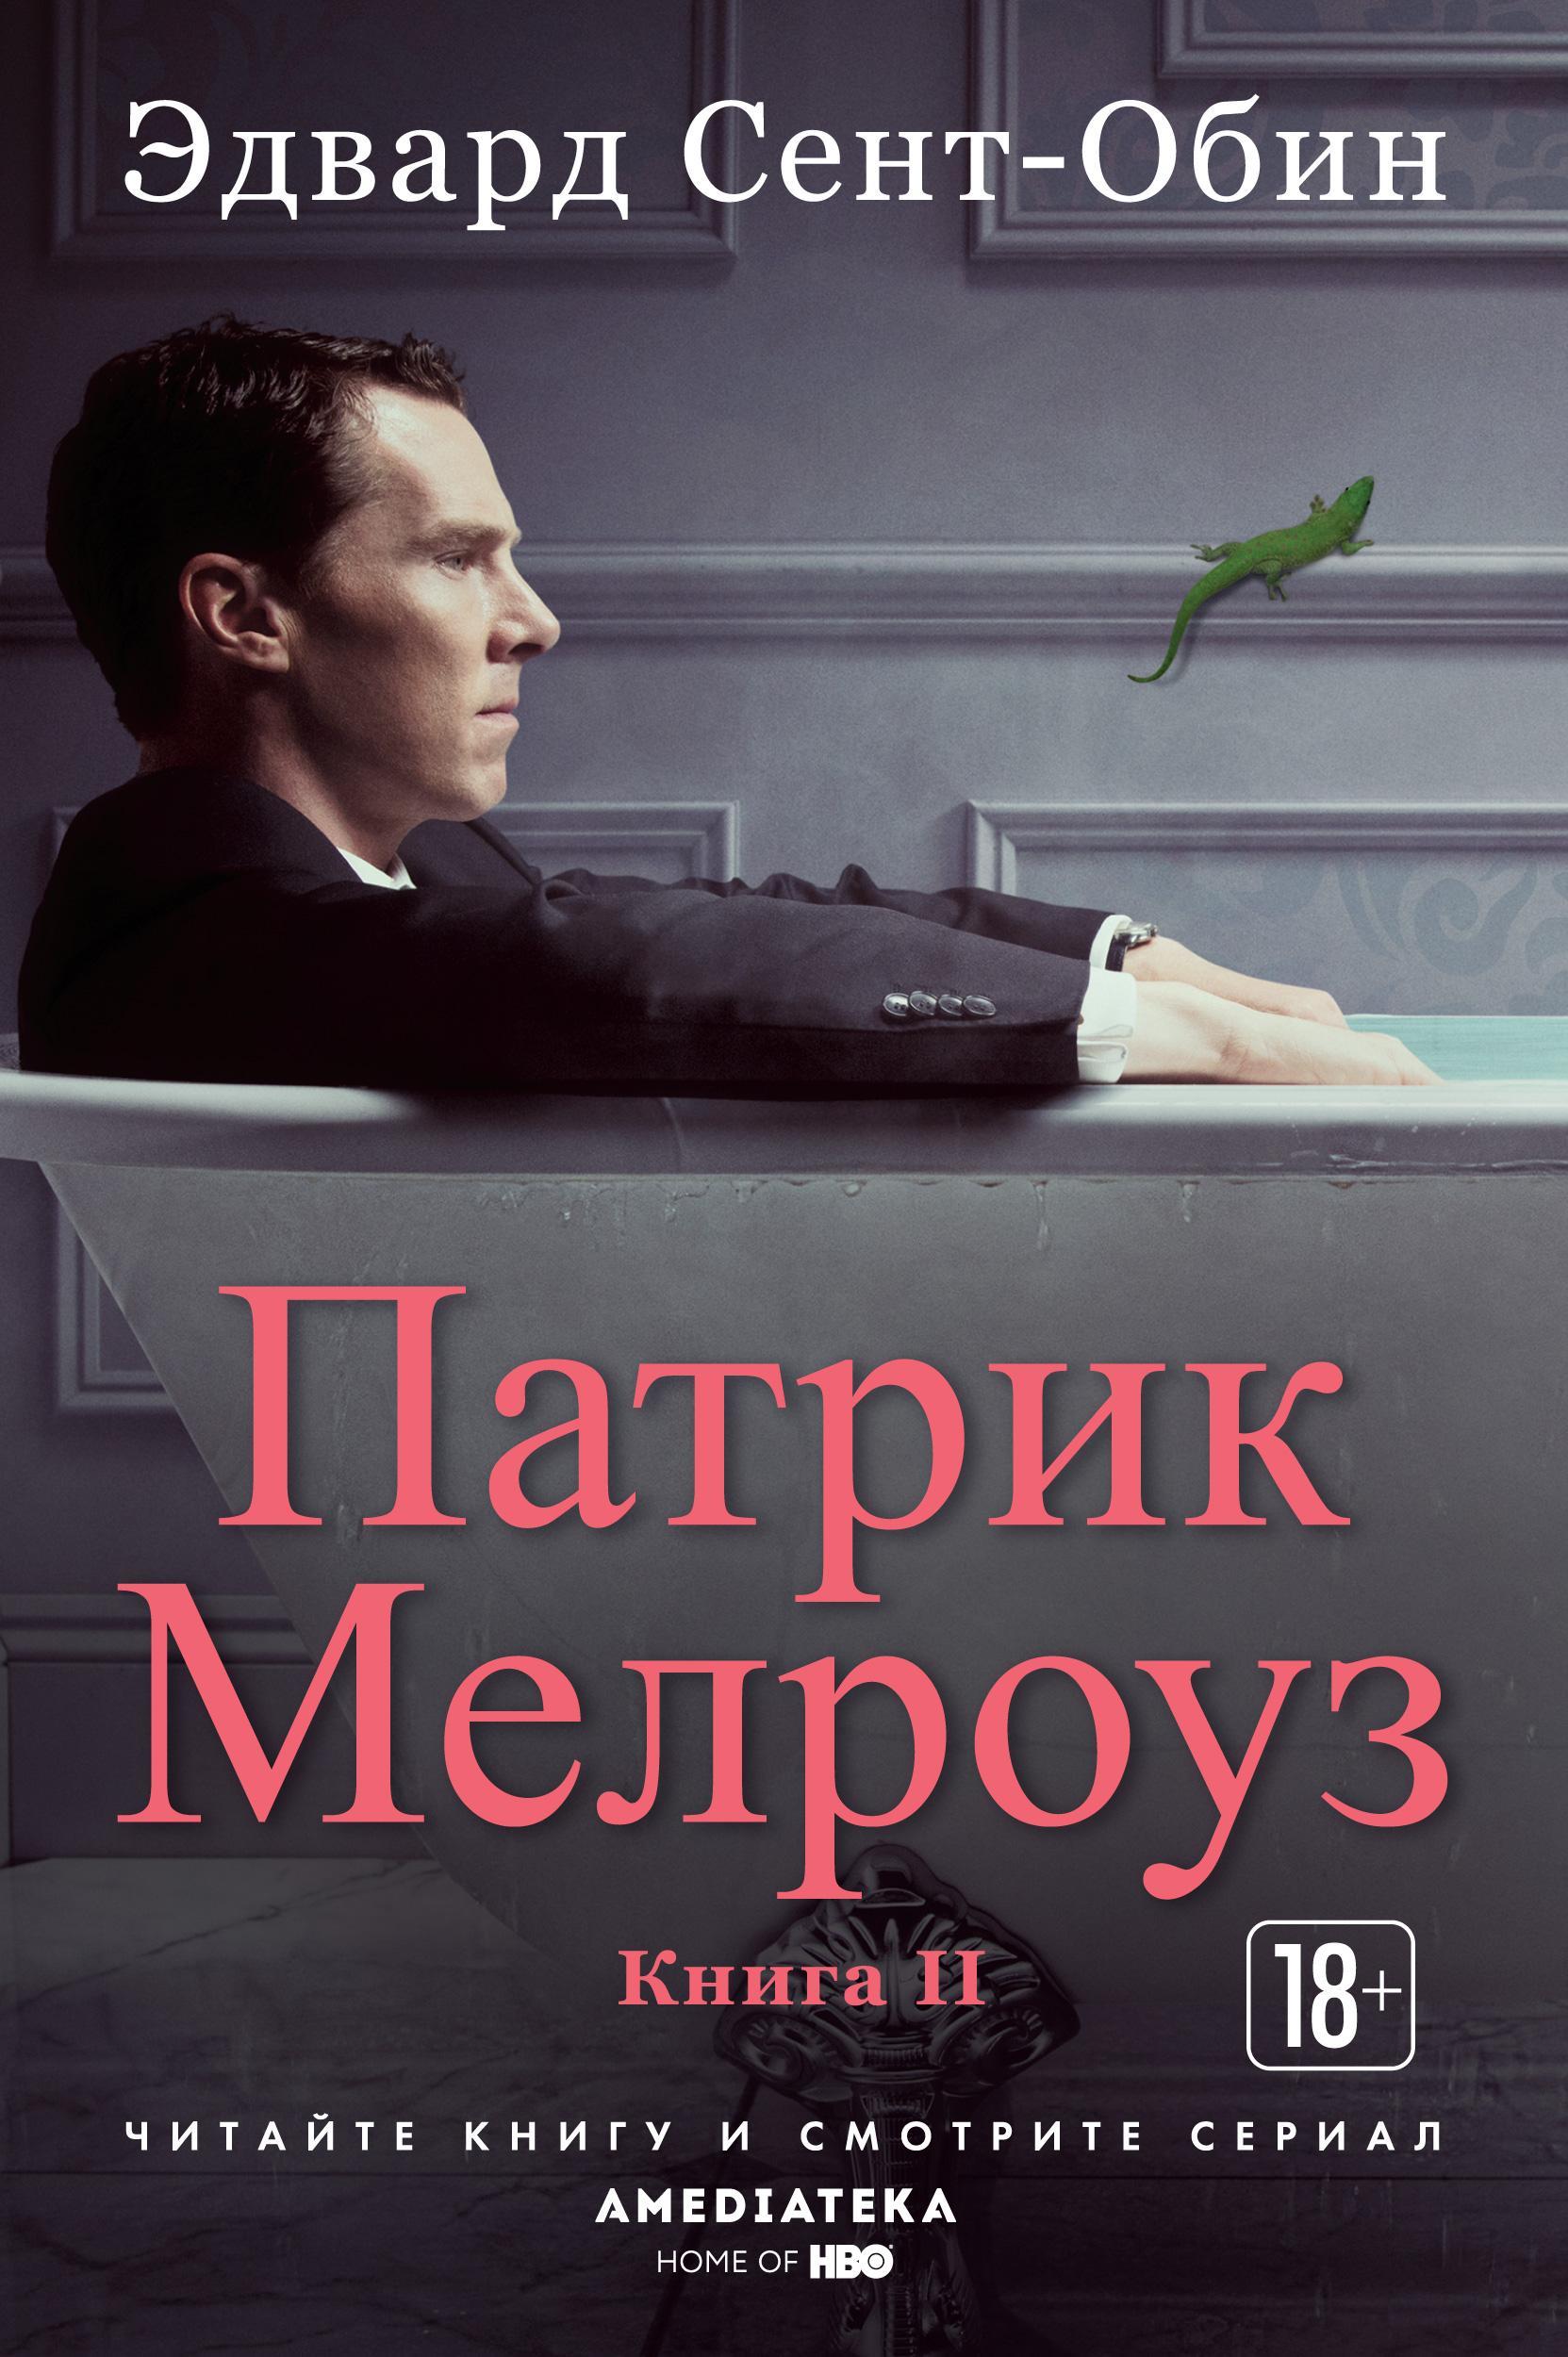 «Патрик Мелроуз. Книга 2» Эдвард Сент-Обин